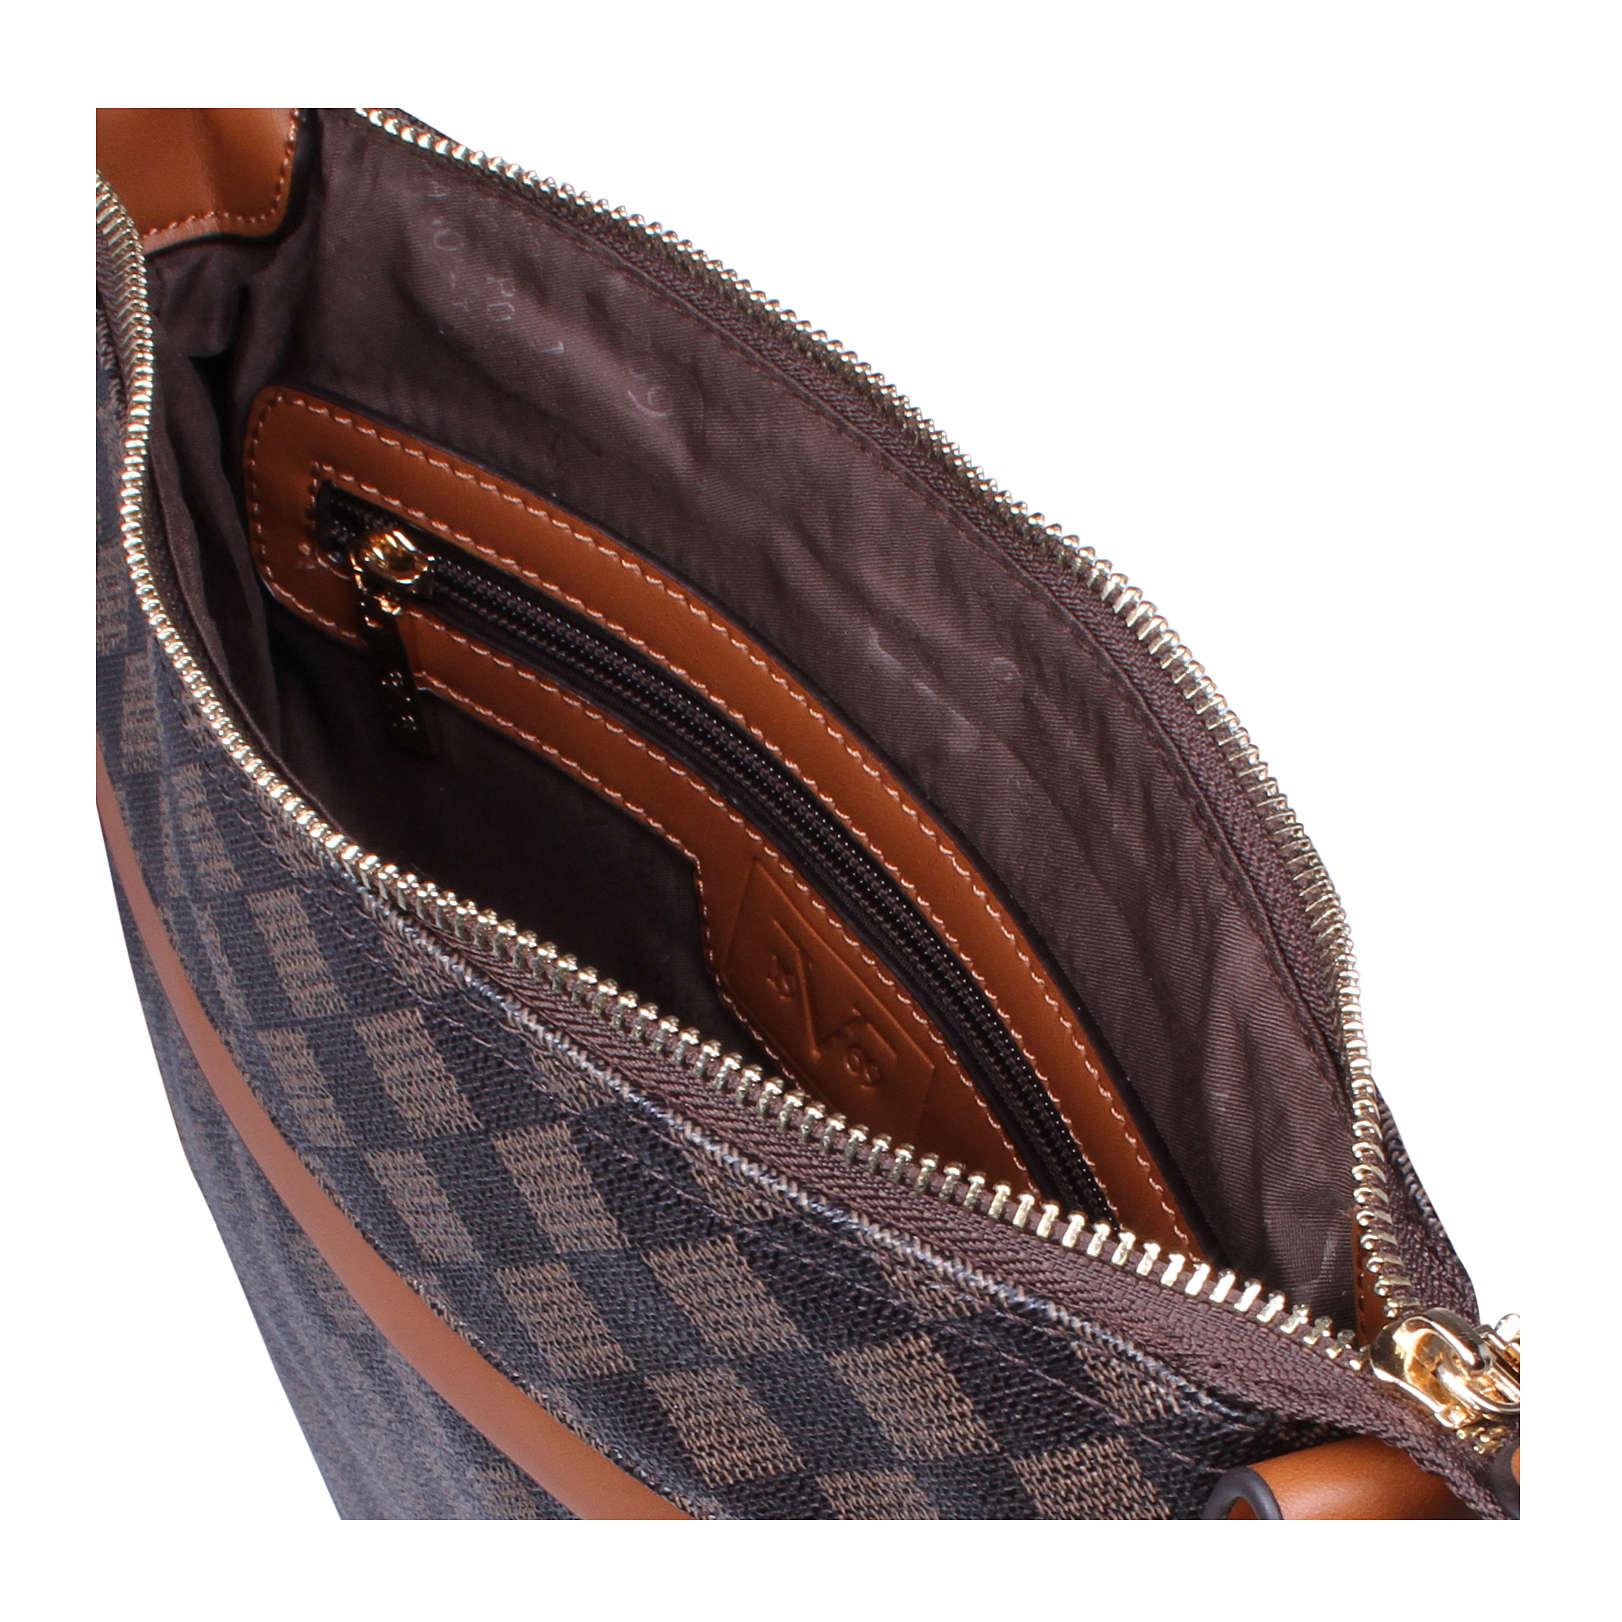 newcross versace 1969 newcross brown handbag by versace 1969. Black Bedroom Furniture Sets. Home Design Ideas